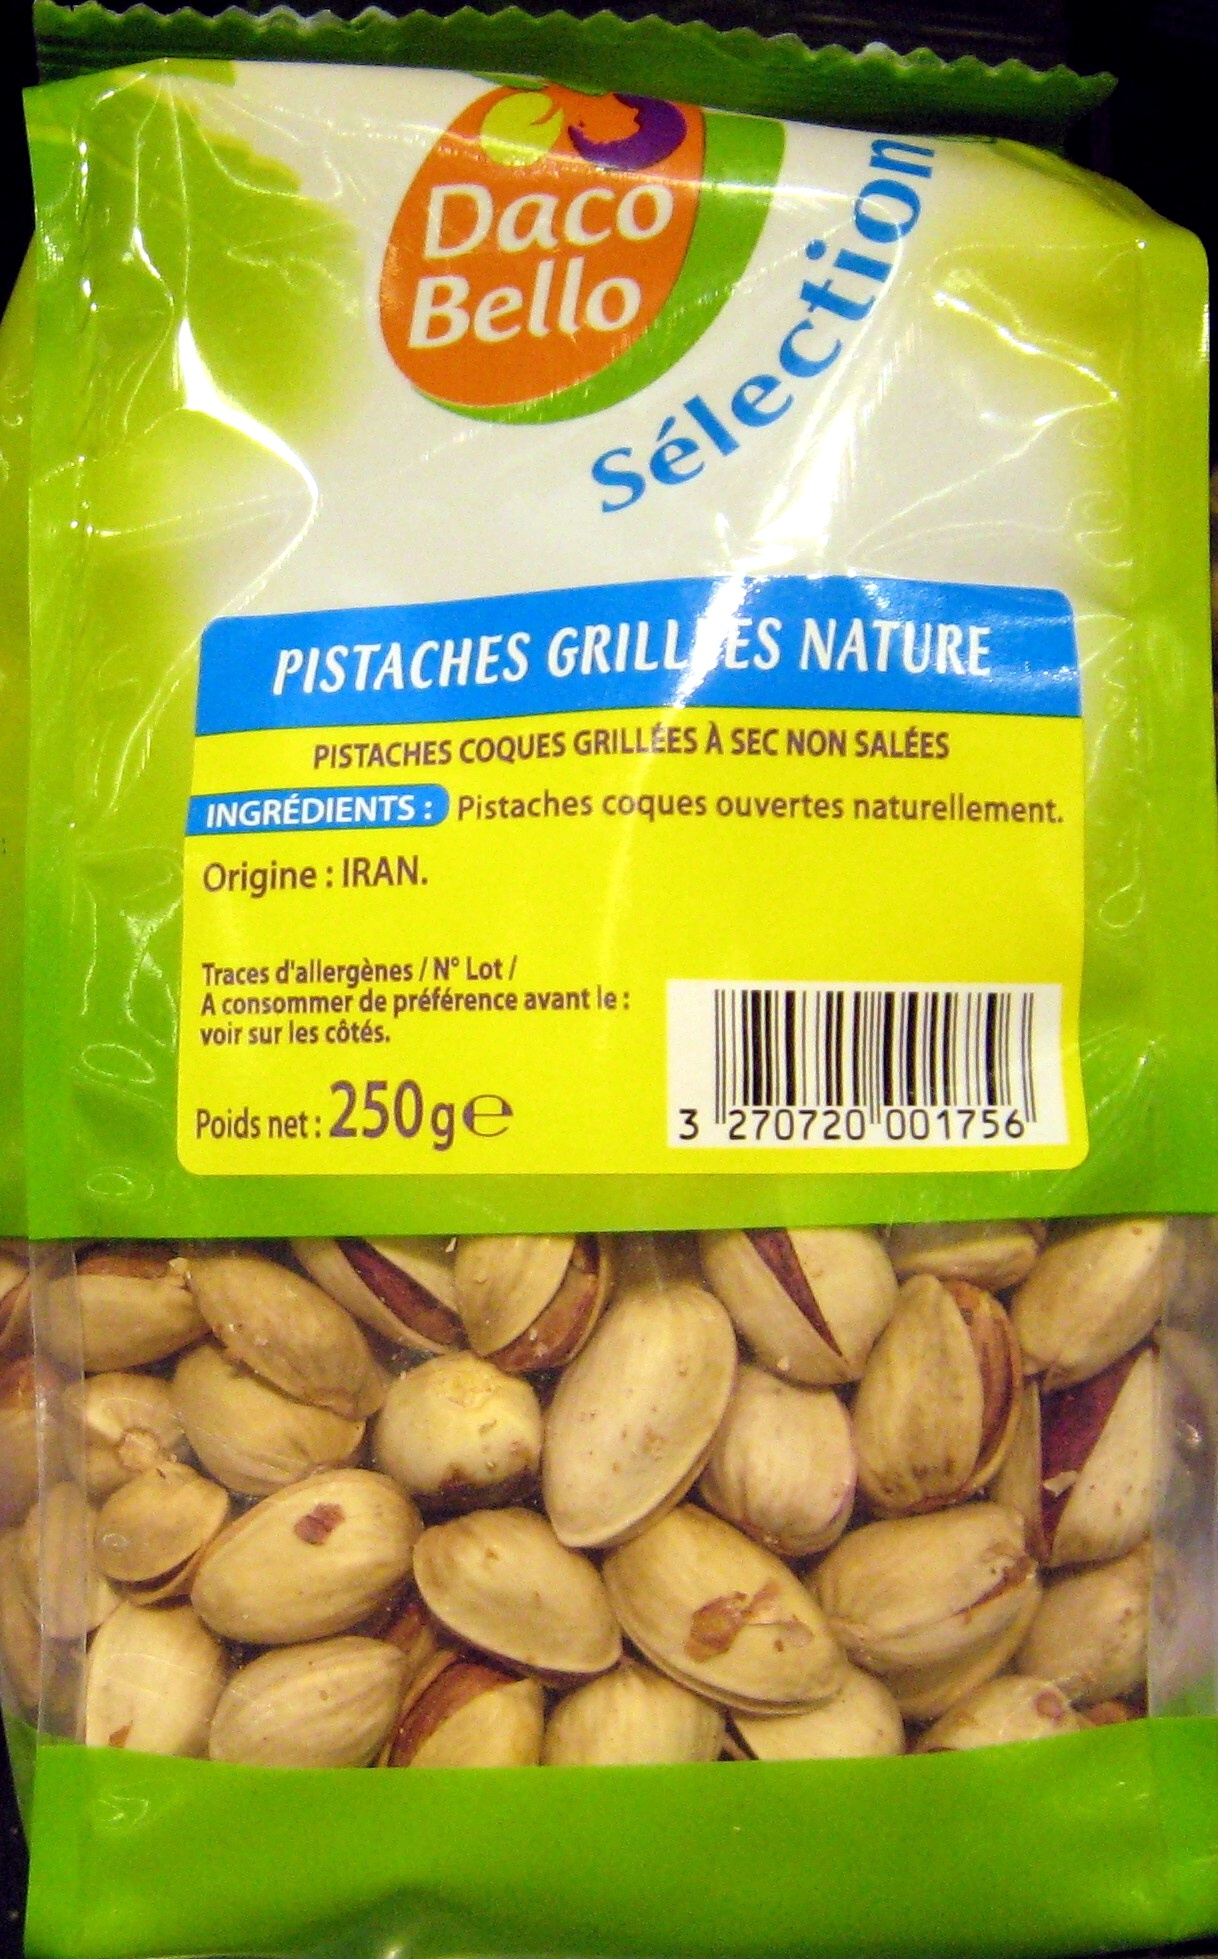 Pistaches grillées nature Daco Bello - Product - fr